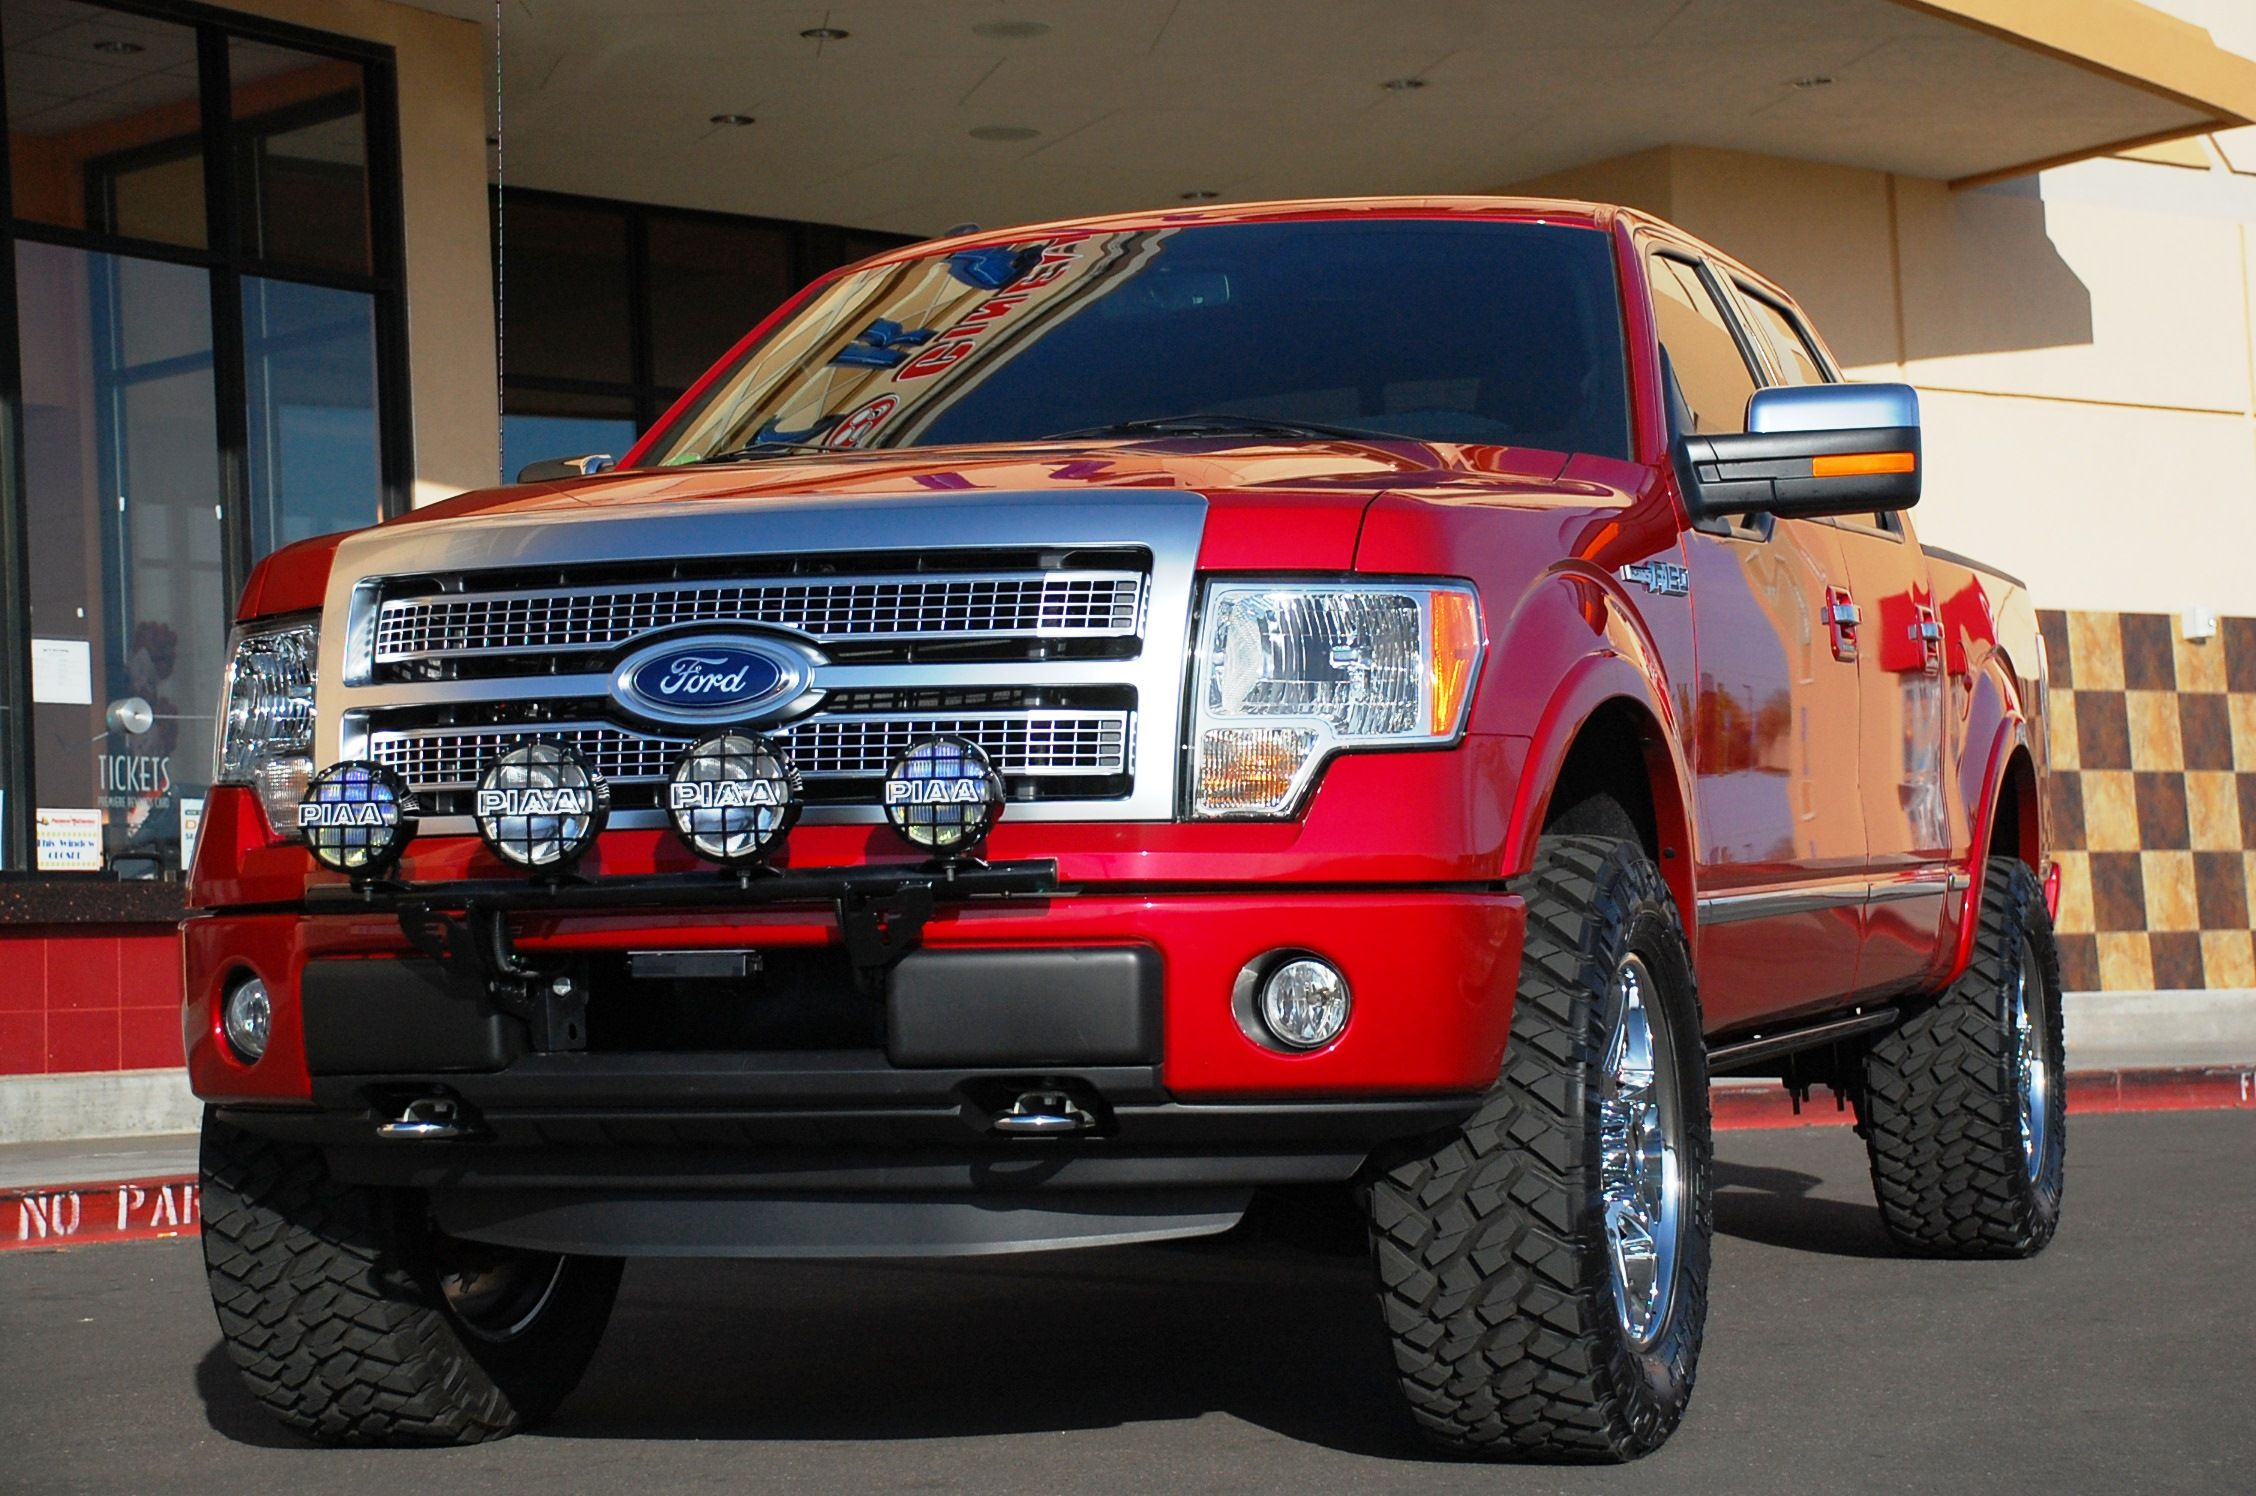 Desert dawg s custom 2011 ford f150 platinum 5 0l supercrew 4x4 2 5 inch bds